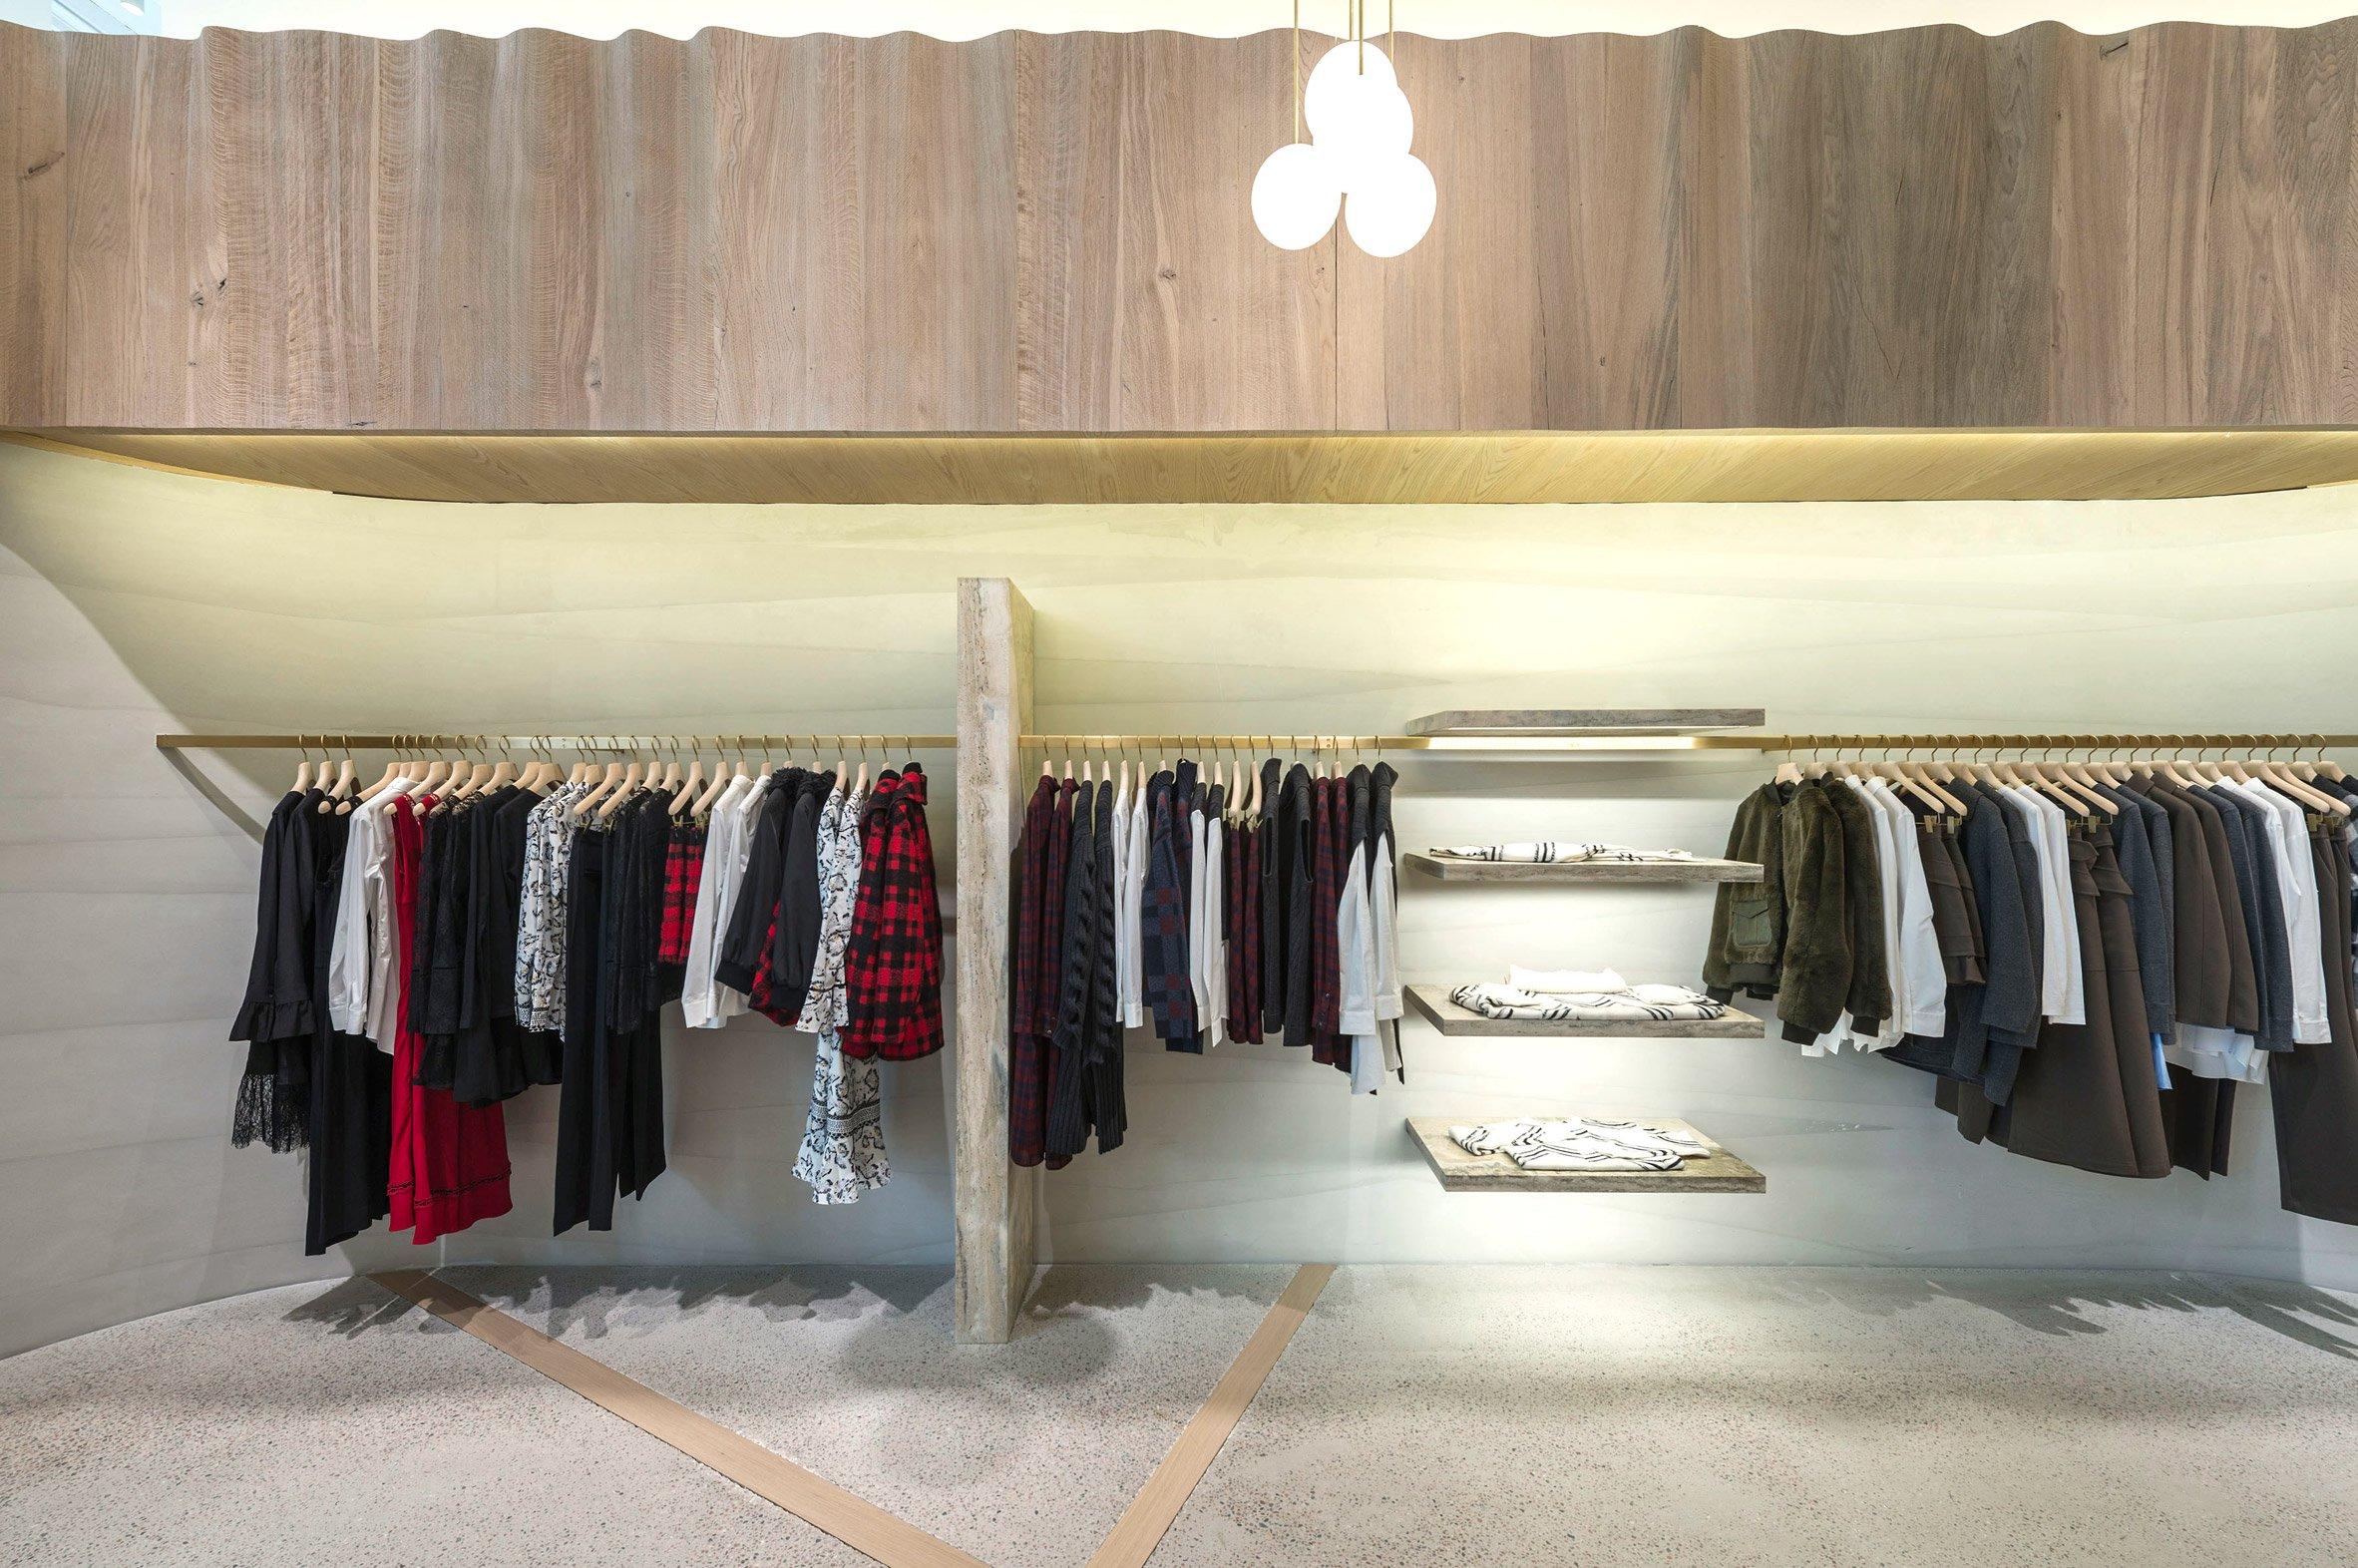 thakoon-ny-avra-madison-fashion-retail-store-shop-interior-design-fernando-mastrangelo-new-york-city-usa_dezeen_2364_col_9